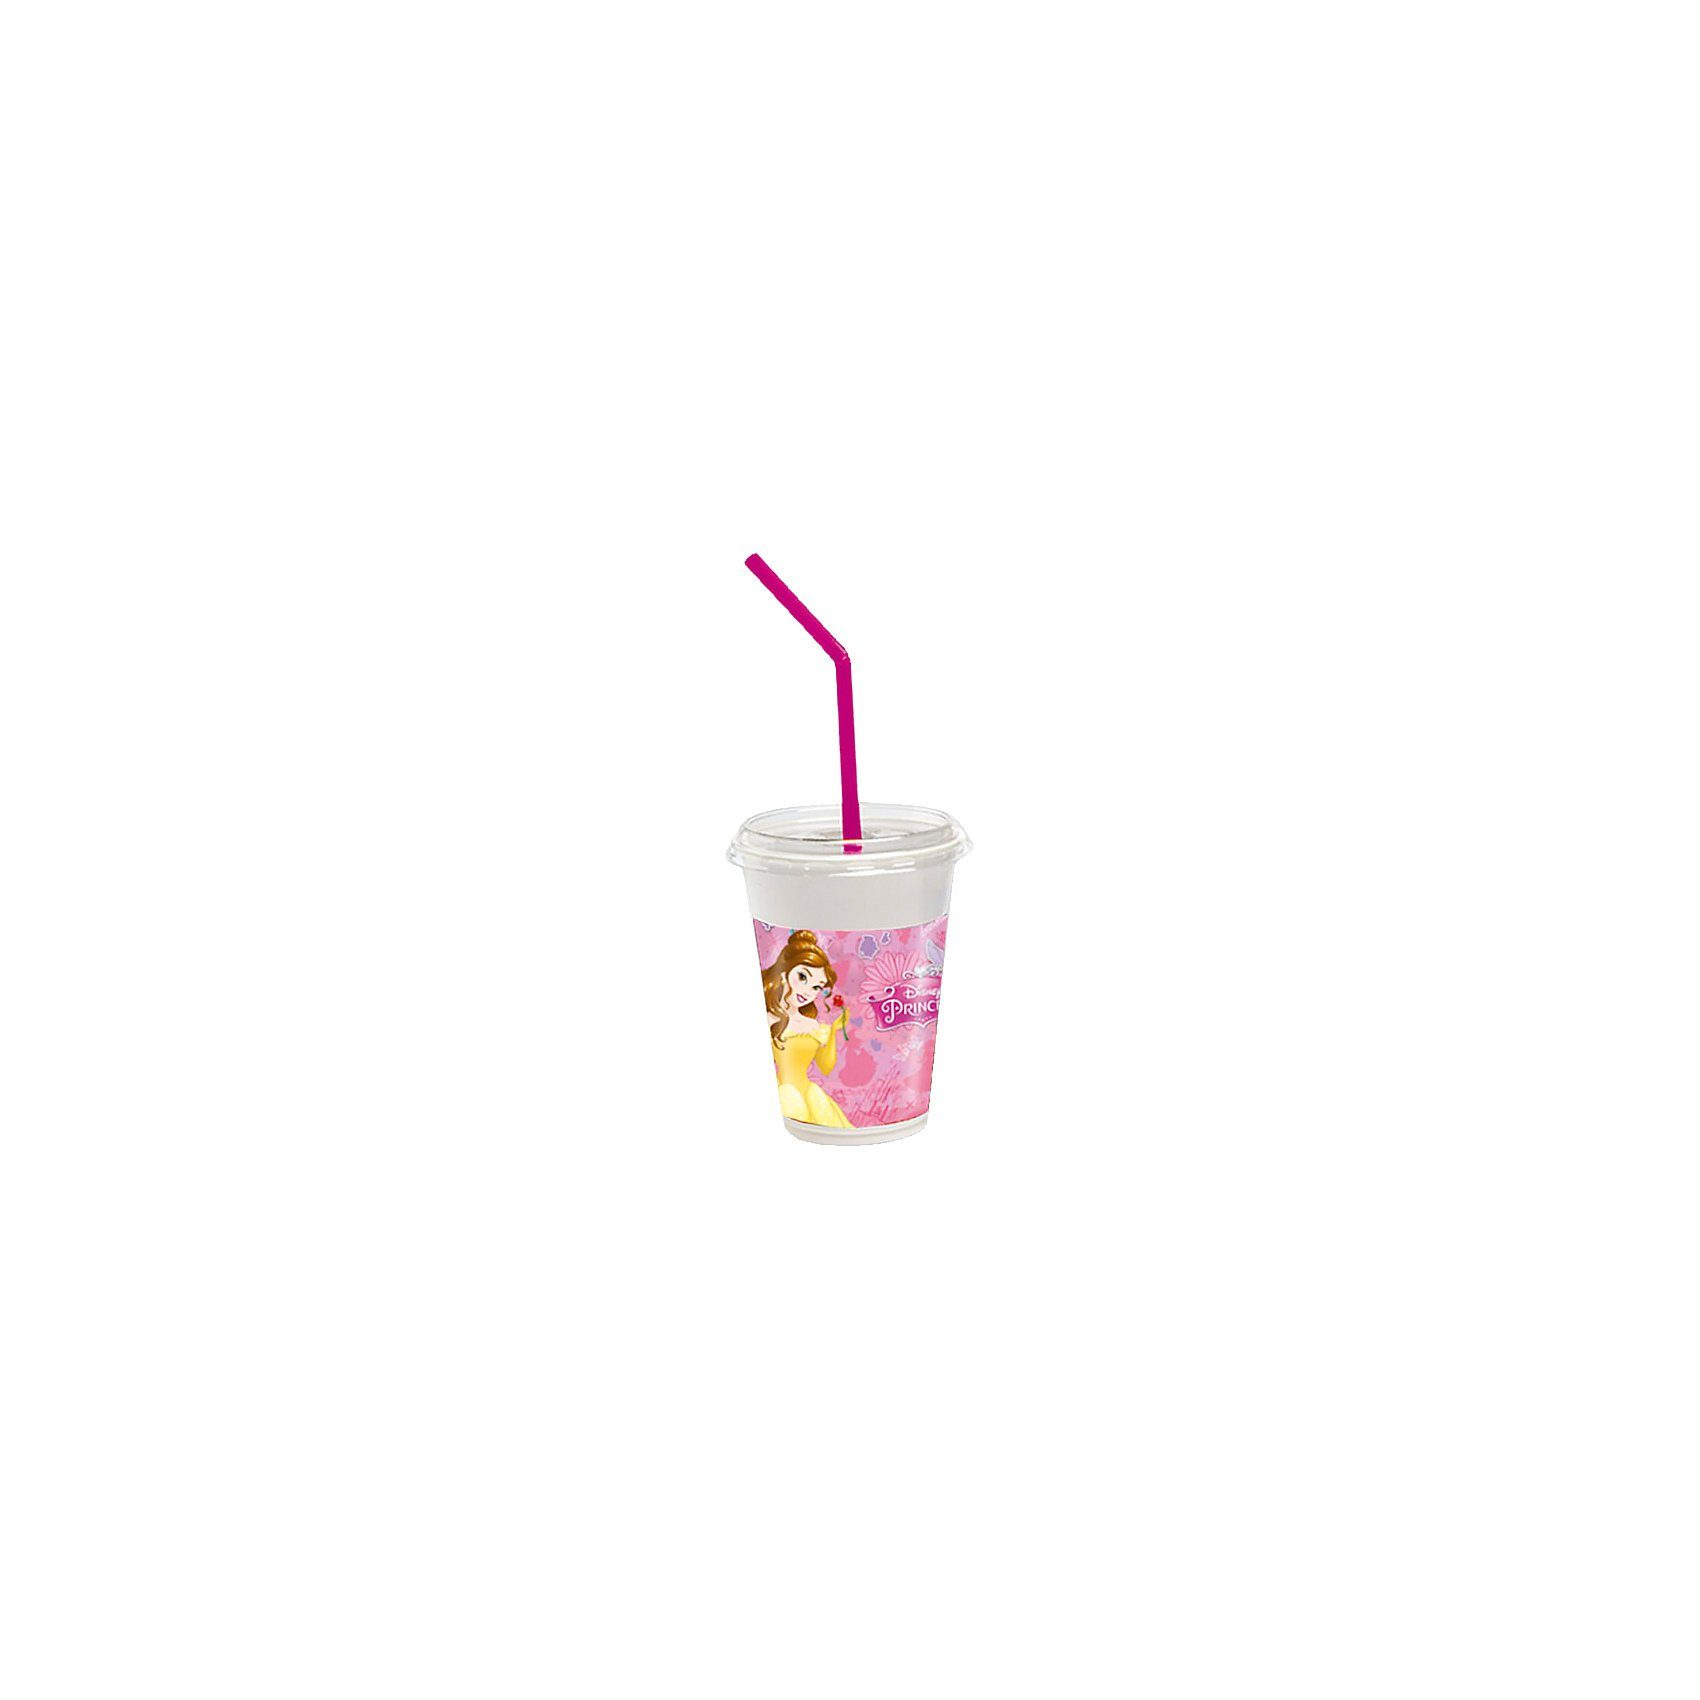 Procos Einwegbecher Kunststoff inkl. Deckel Disney Princess, 300 ml